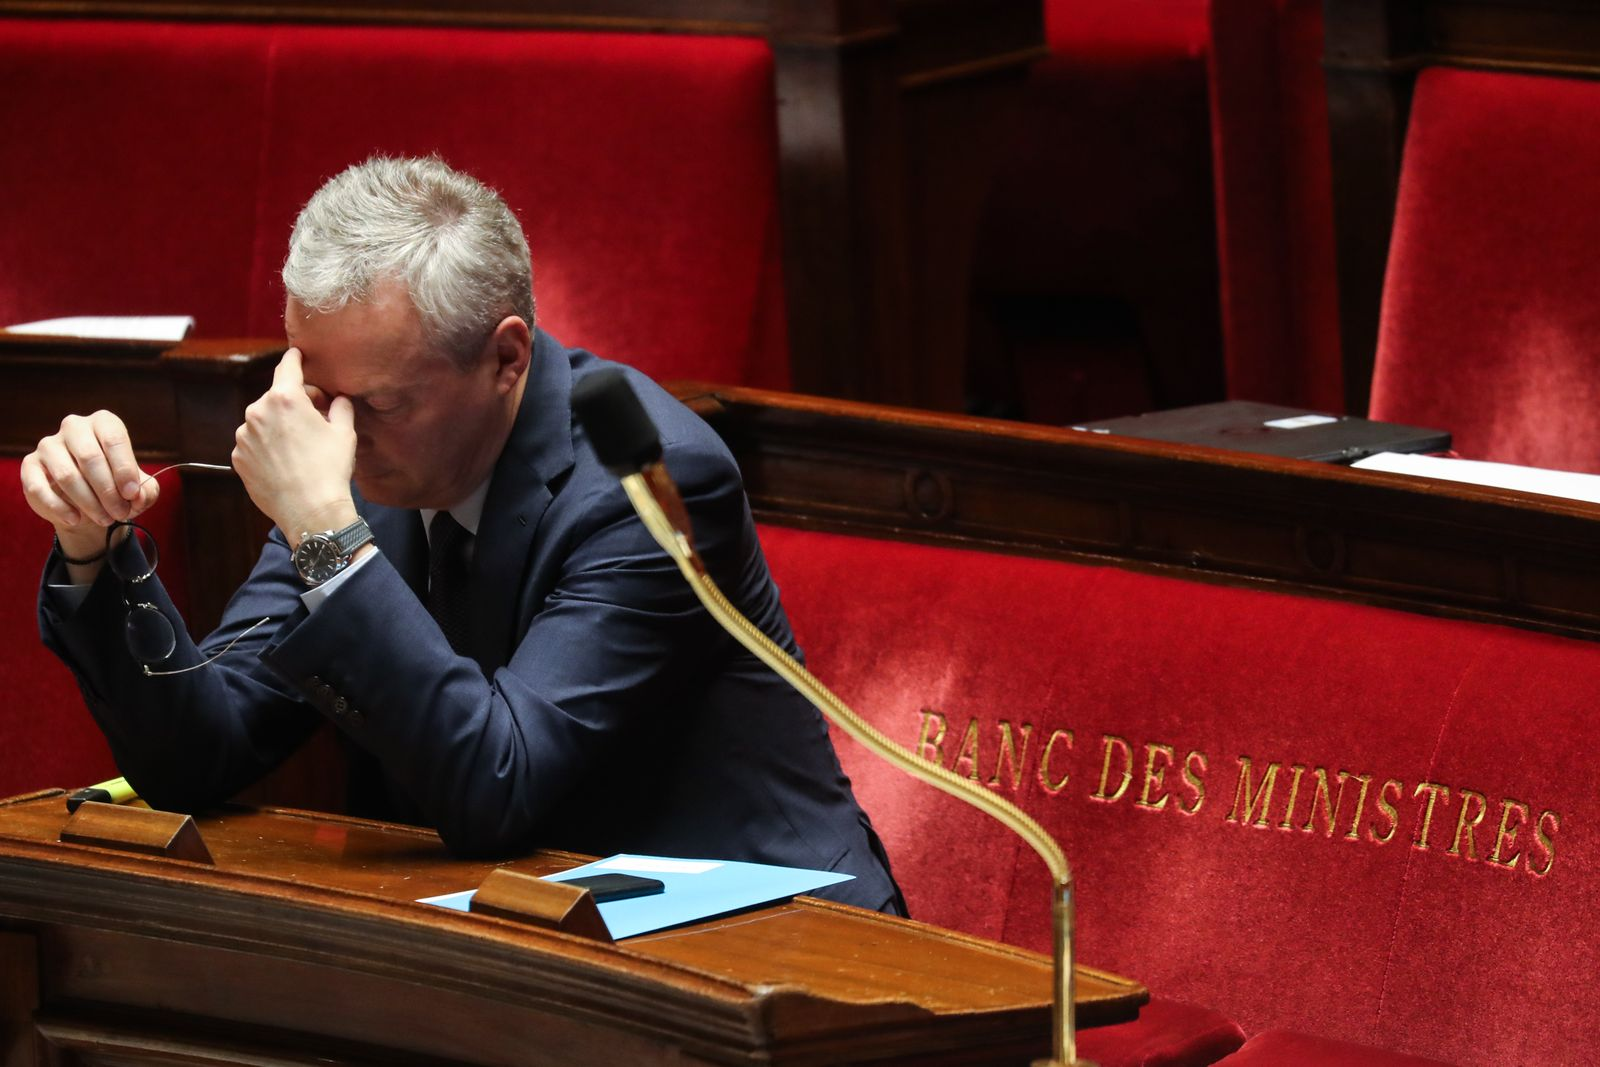 FRANCE-POLITICS-PARLIAMENT-GOVERNMENT-BUDGET